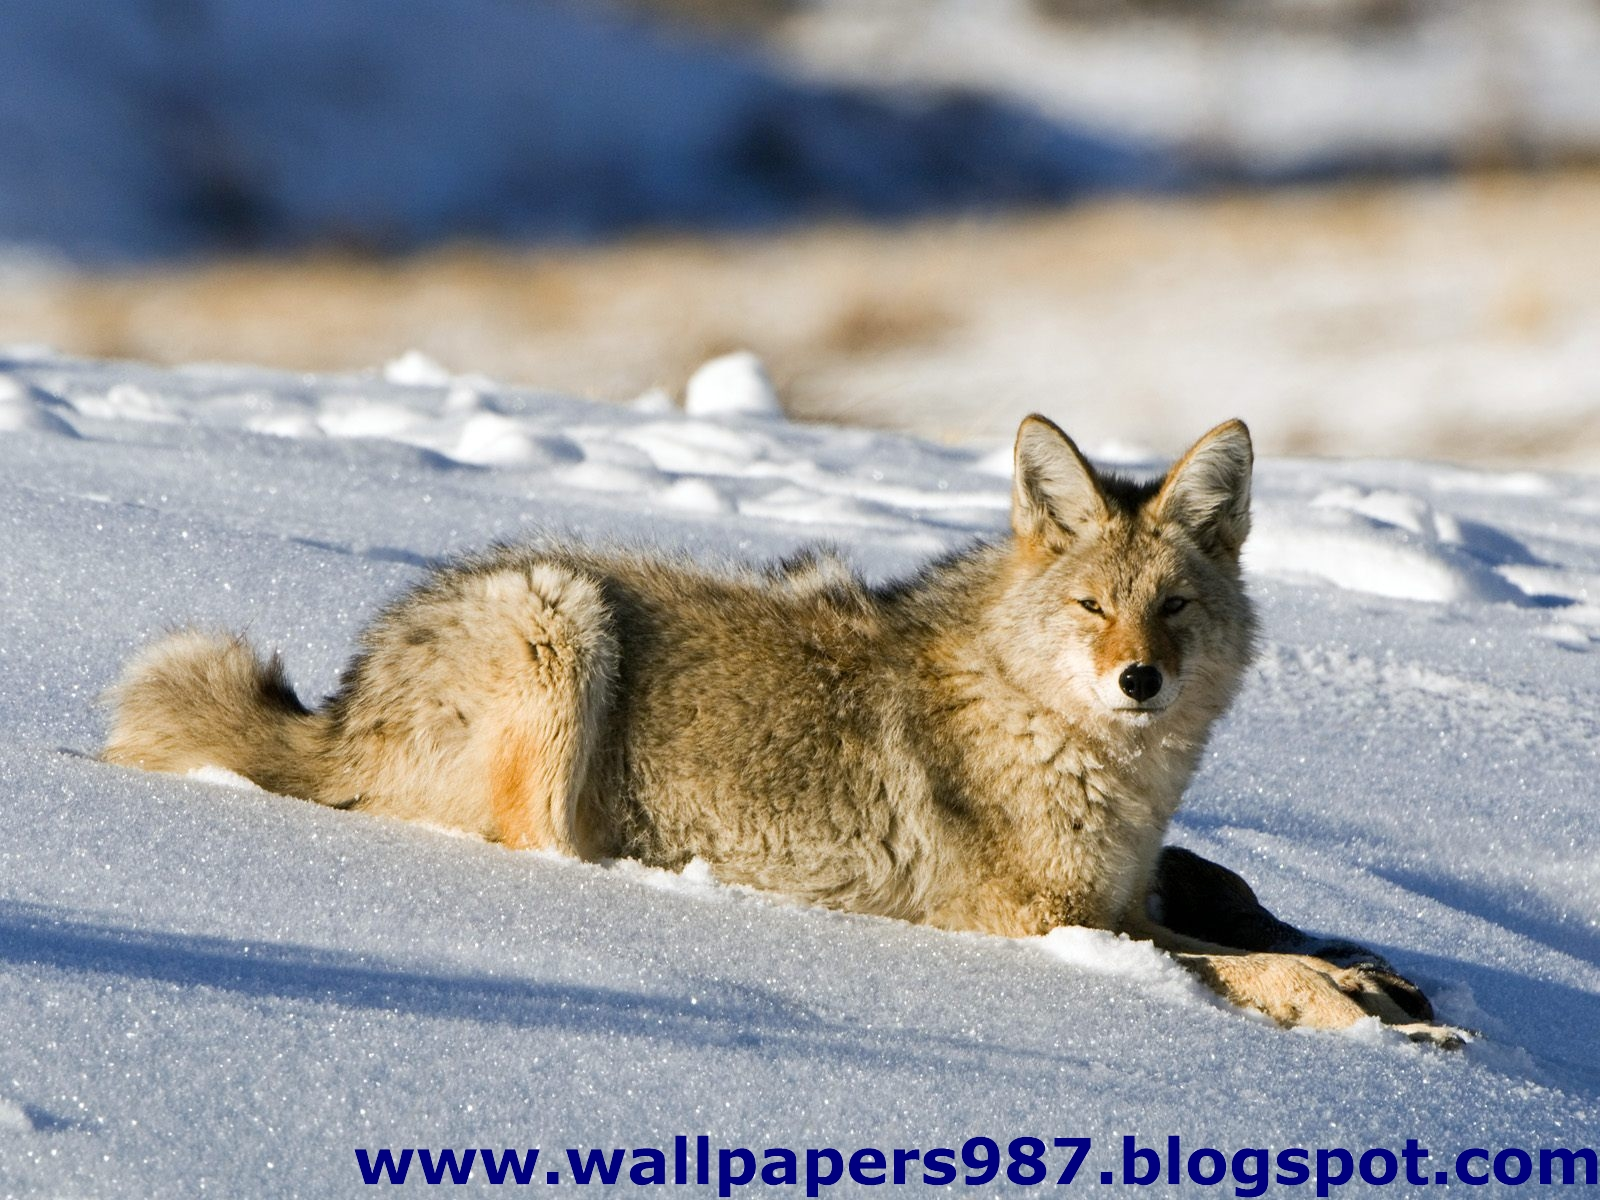 http://1.bp.blogspot.com/_SOSNZoTv8ng/TQYVfjbbDSI/AAAAAAAAAHA/Qshe88X4jyY/s1600/windows_masaustu_arka_plan_resimleri_vahsi_kediler_aslan_kaplan_HD_HQ_Full_Animal.+Pic+%252838%2529.jpg